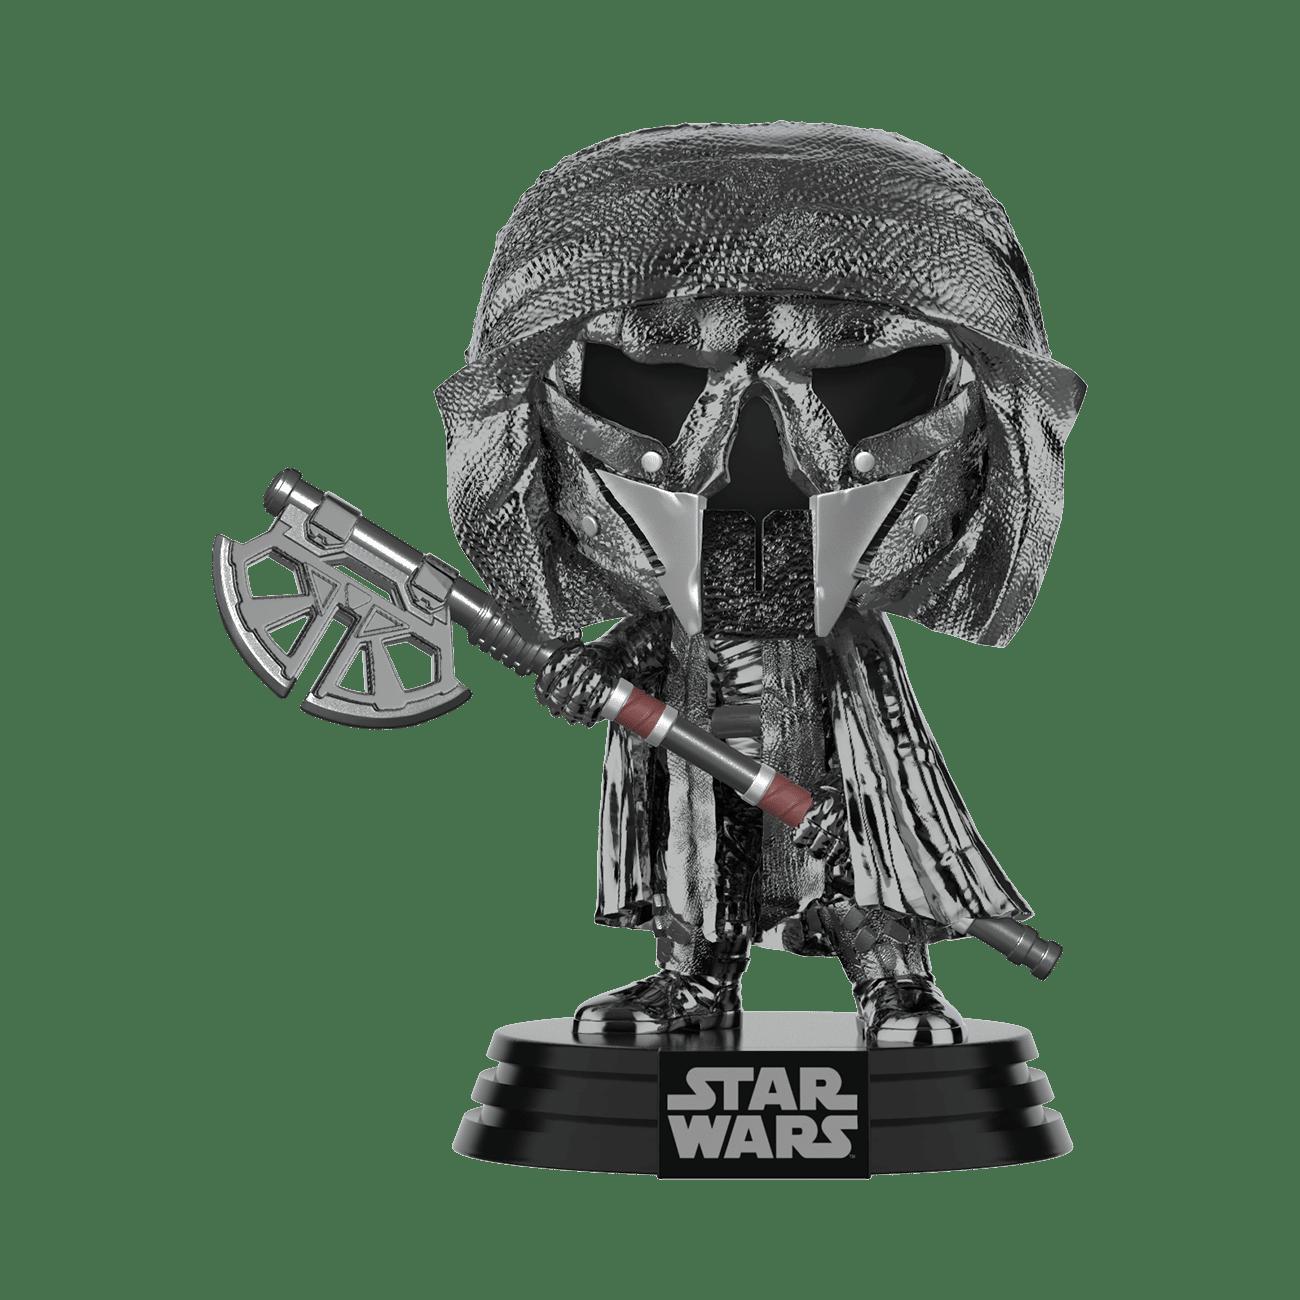 PRE-ORDER Star Wars: The Rise of Skywalker Hematite Chrome Knight of Ren Axe Pop! Vinyl Figure